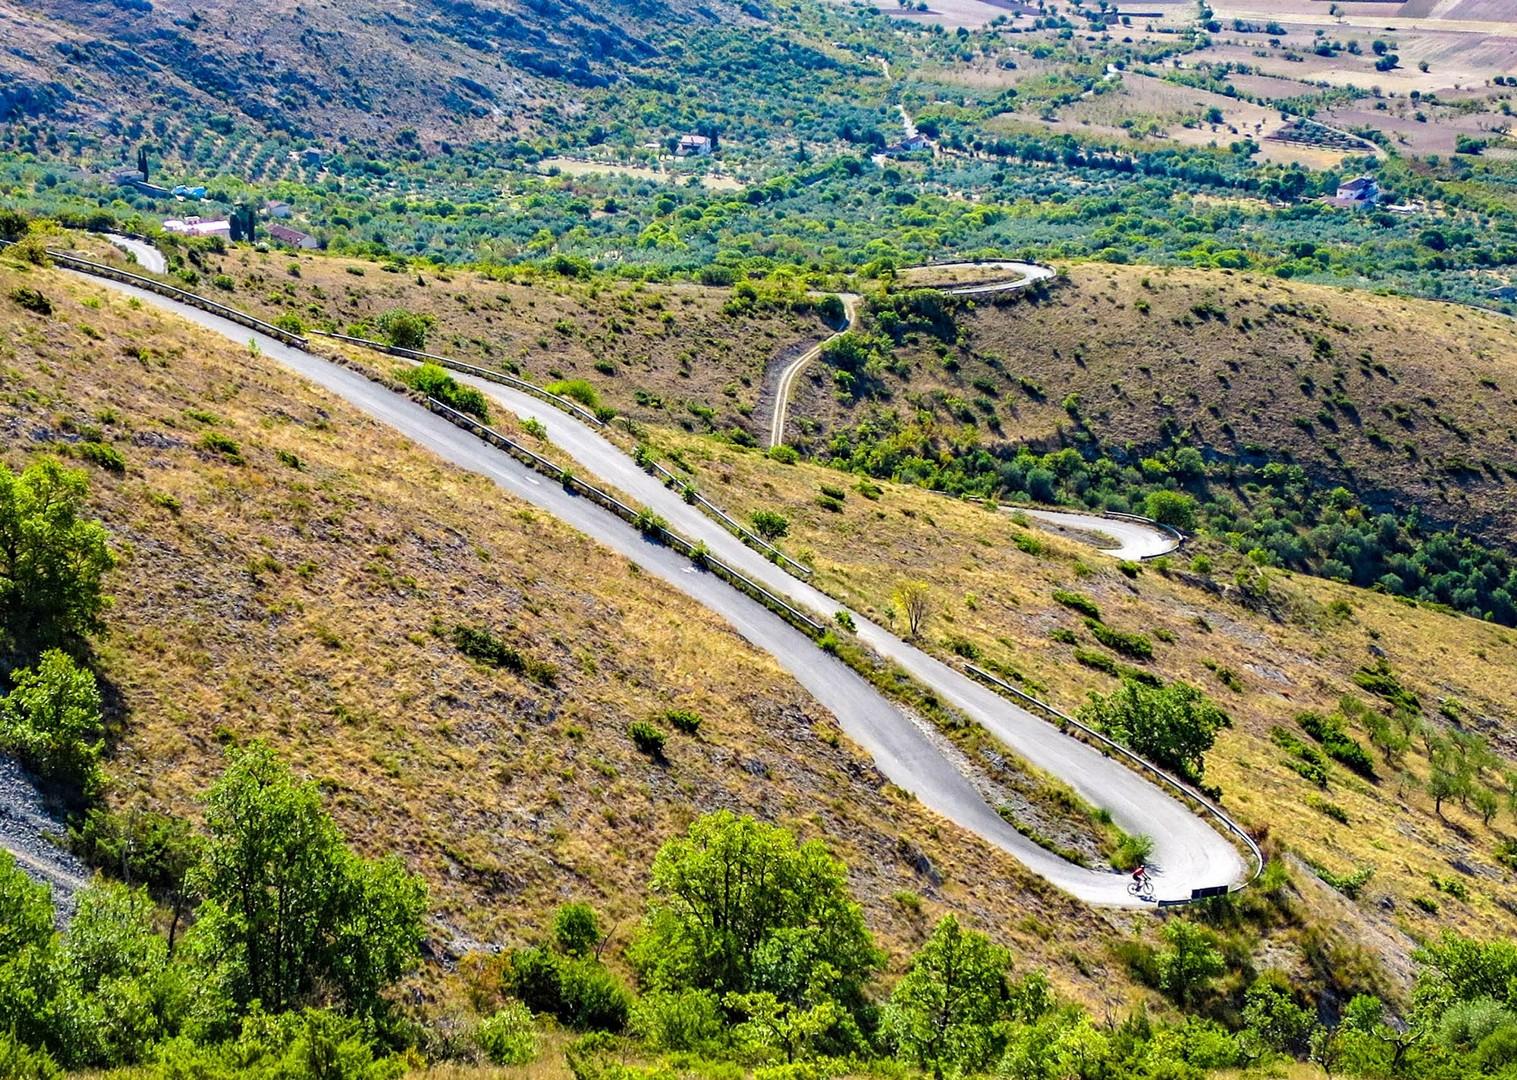 descent-italy-guided-road-cycling-holiday-coast-to-coast.jpg - NEW! Italy - Coast to Coast - L'Adriatico al Tirreno - Road Cycling